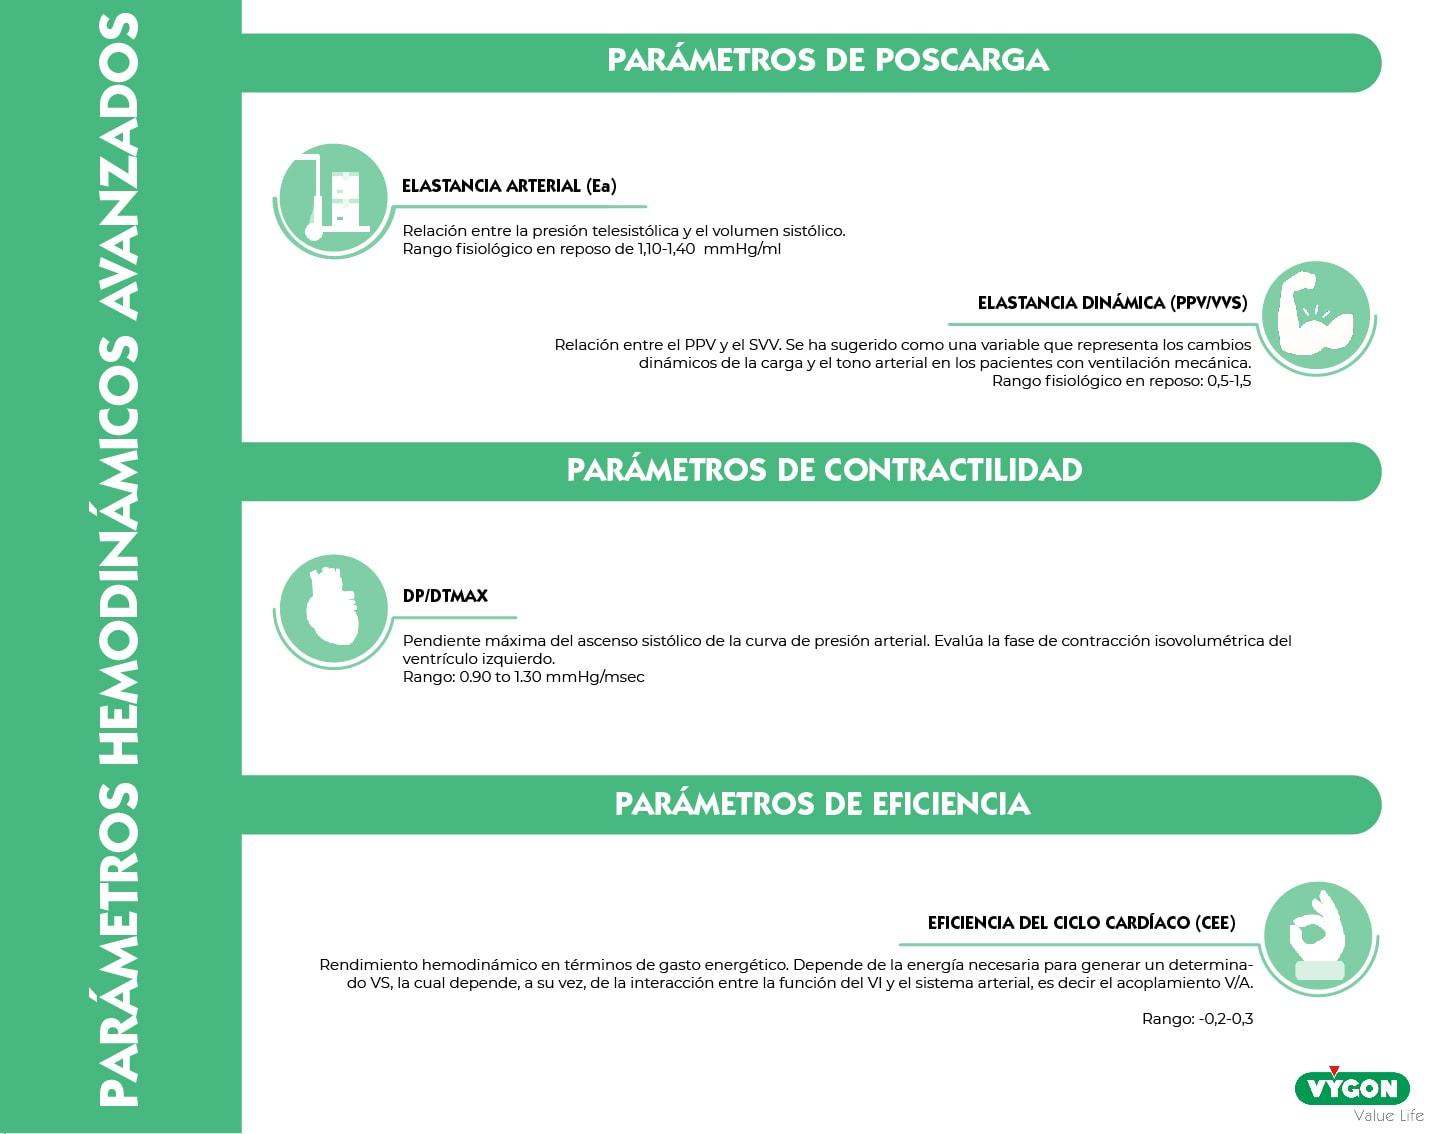 parámetros hemodinámicos avanzados